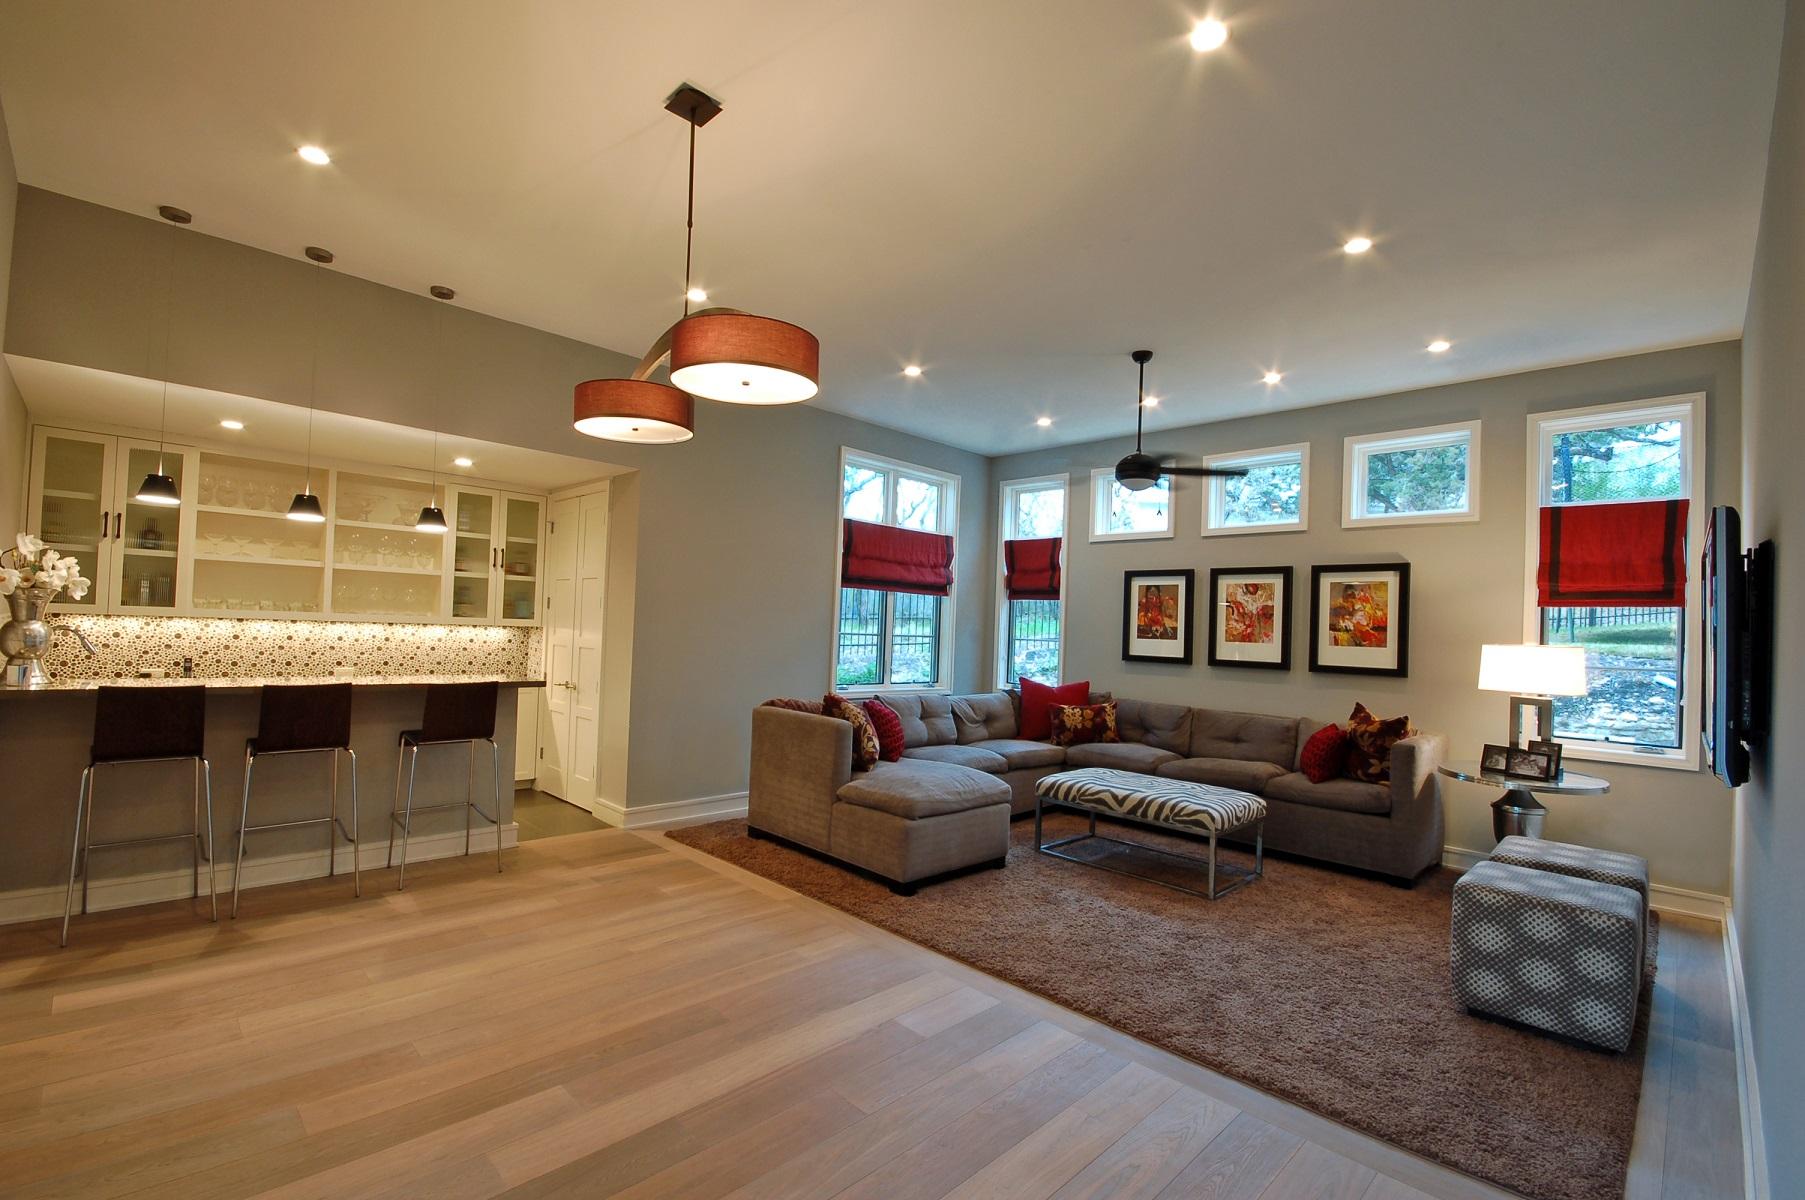 cortona-kitchen-family-room